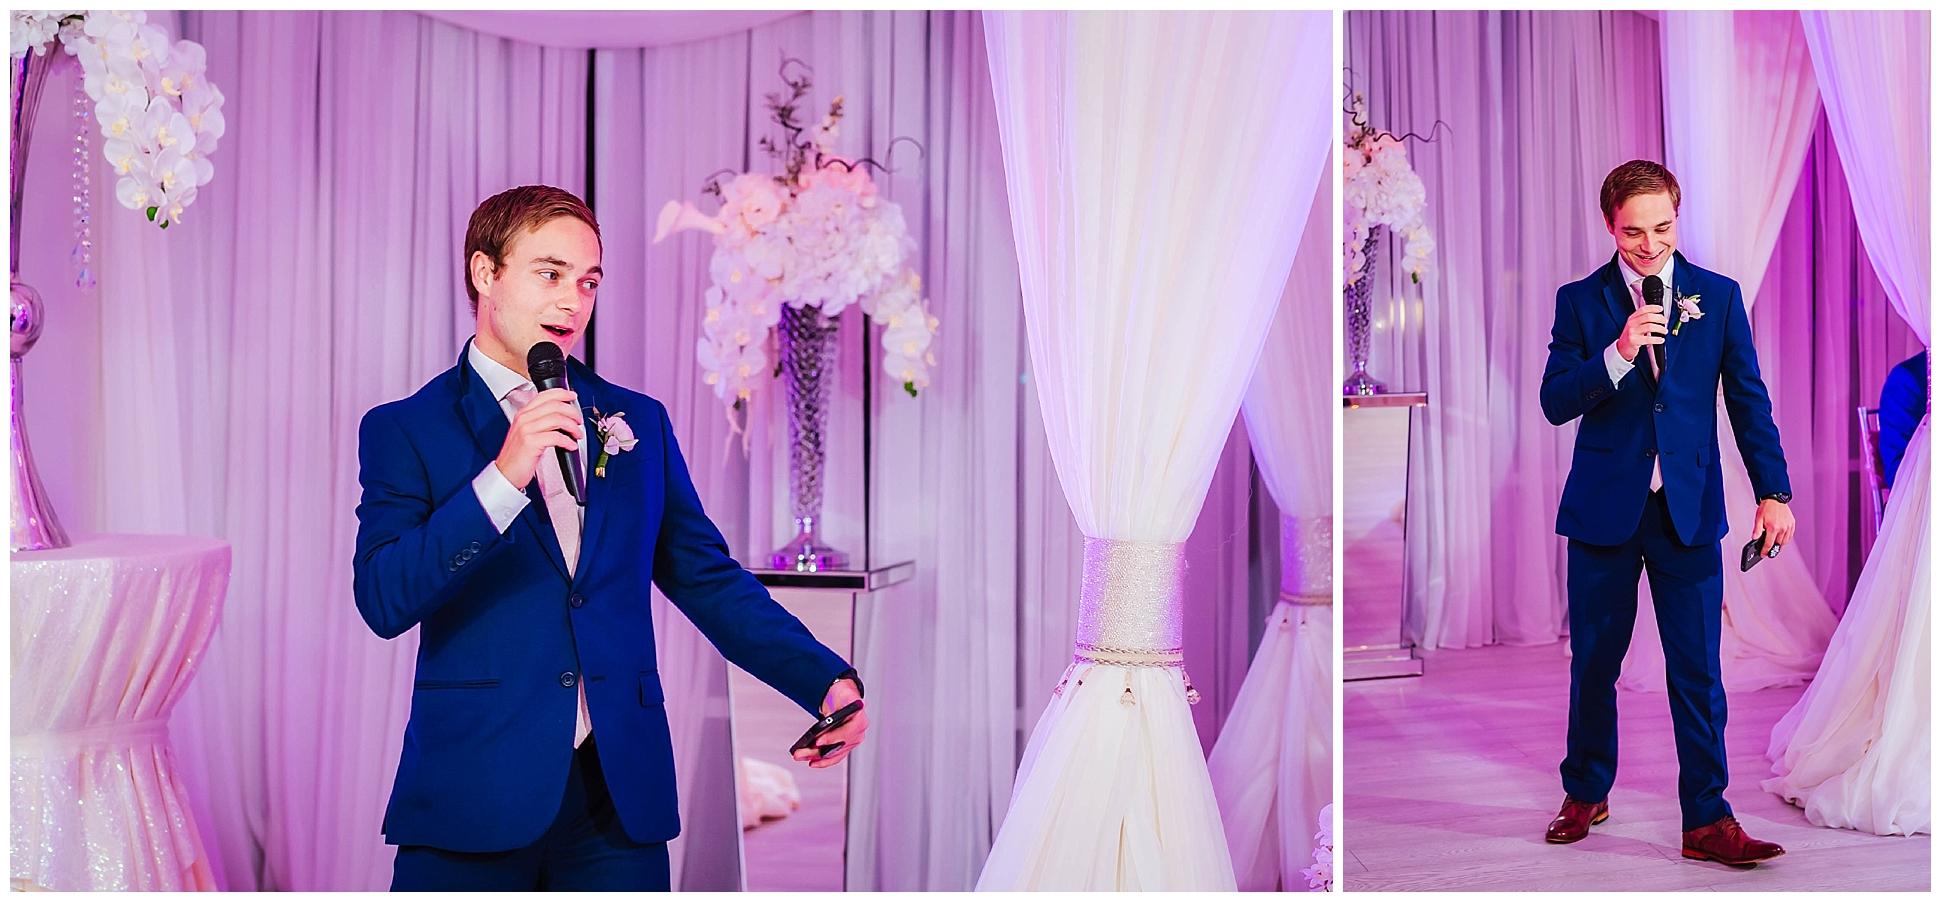 st-pete-wedding-photographer-sunken-gardens-crystal-ballroom-princess-dancer_0192.jpg